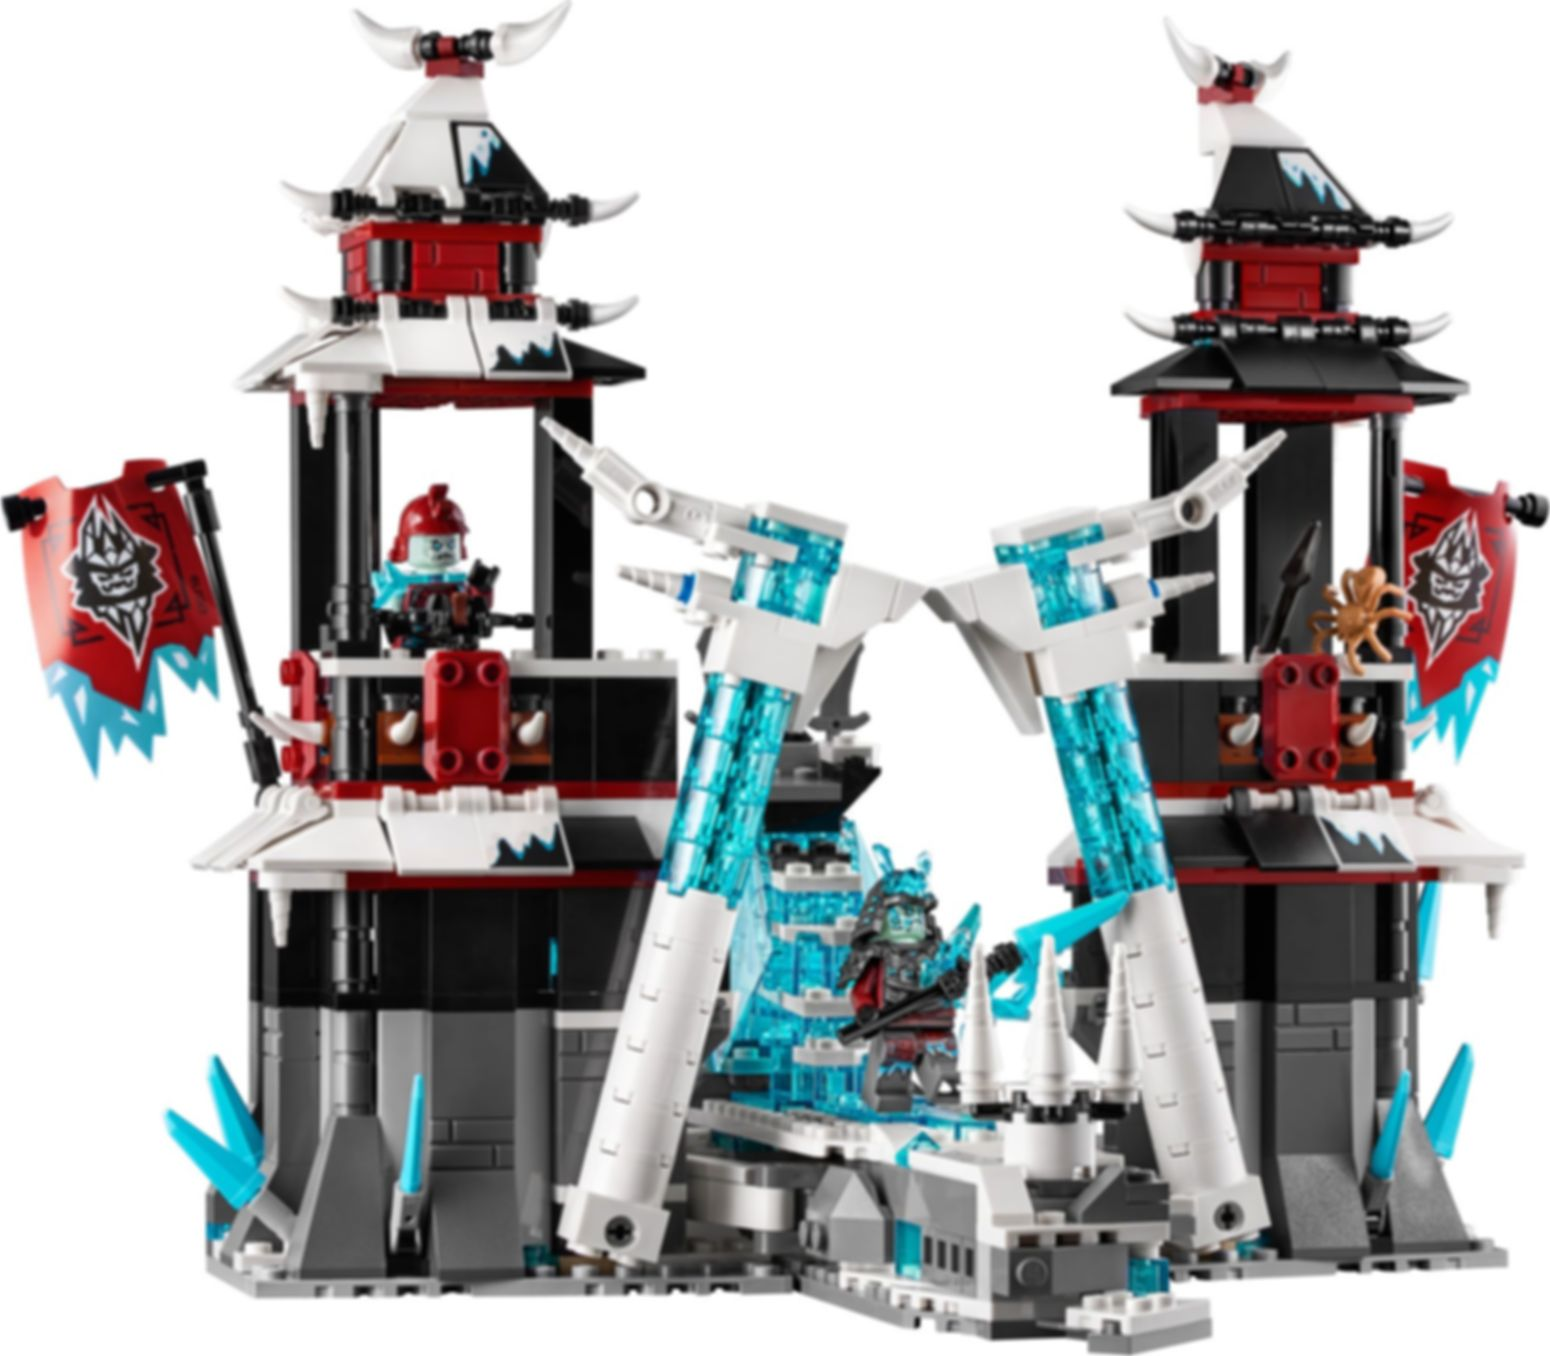 LEGO® Ninjago Castle of the Forsaken Emperor gameplay